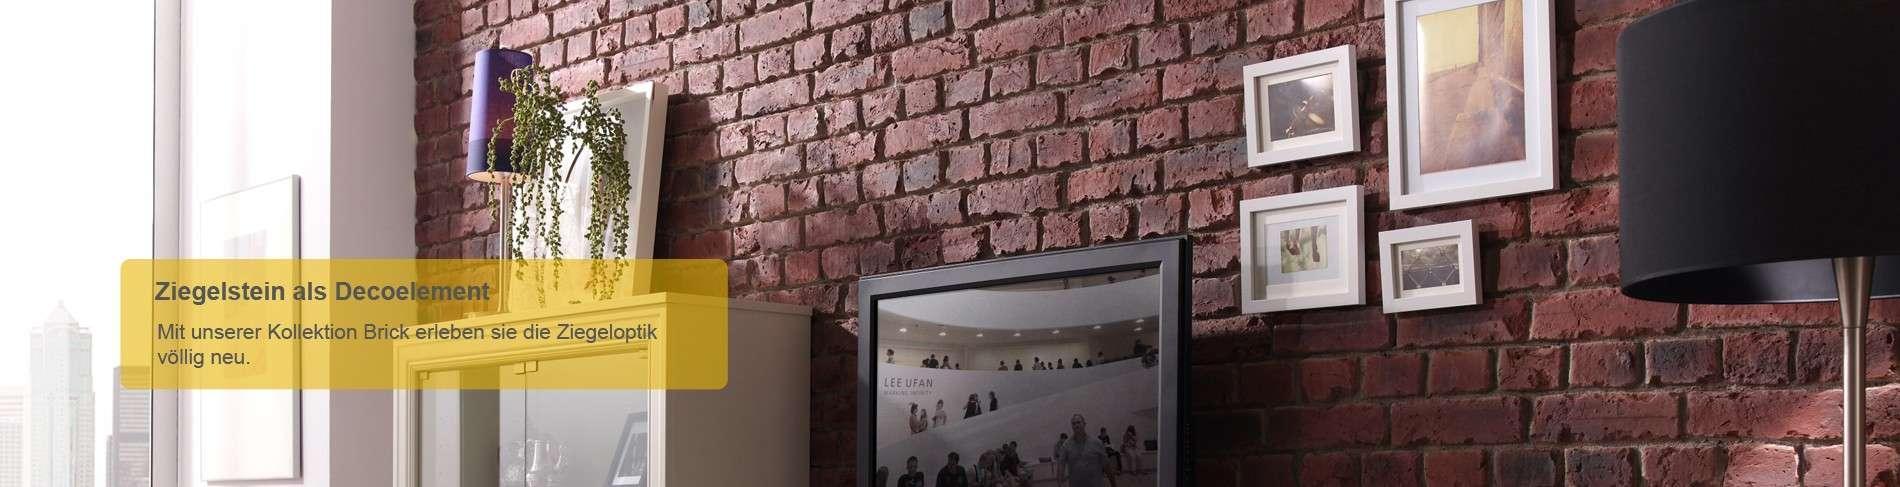 Fassade Mutig Wandverkleidung,verblendsteine,kunststein,steinoptik Wandpaneele,wandverblender